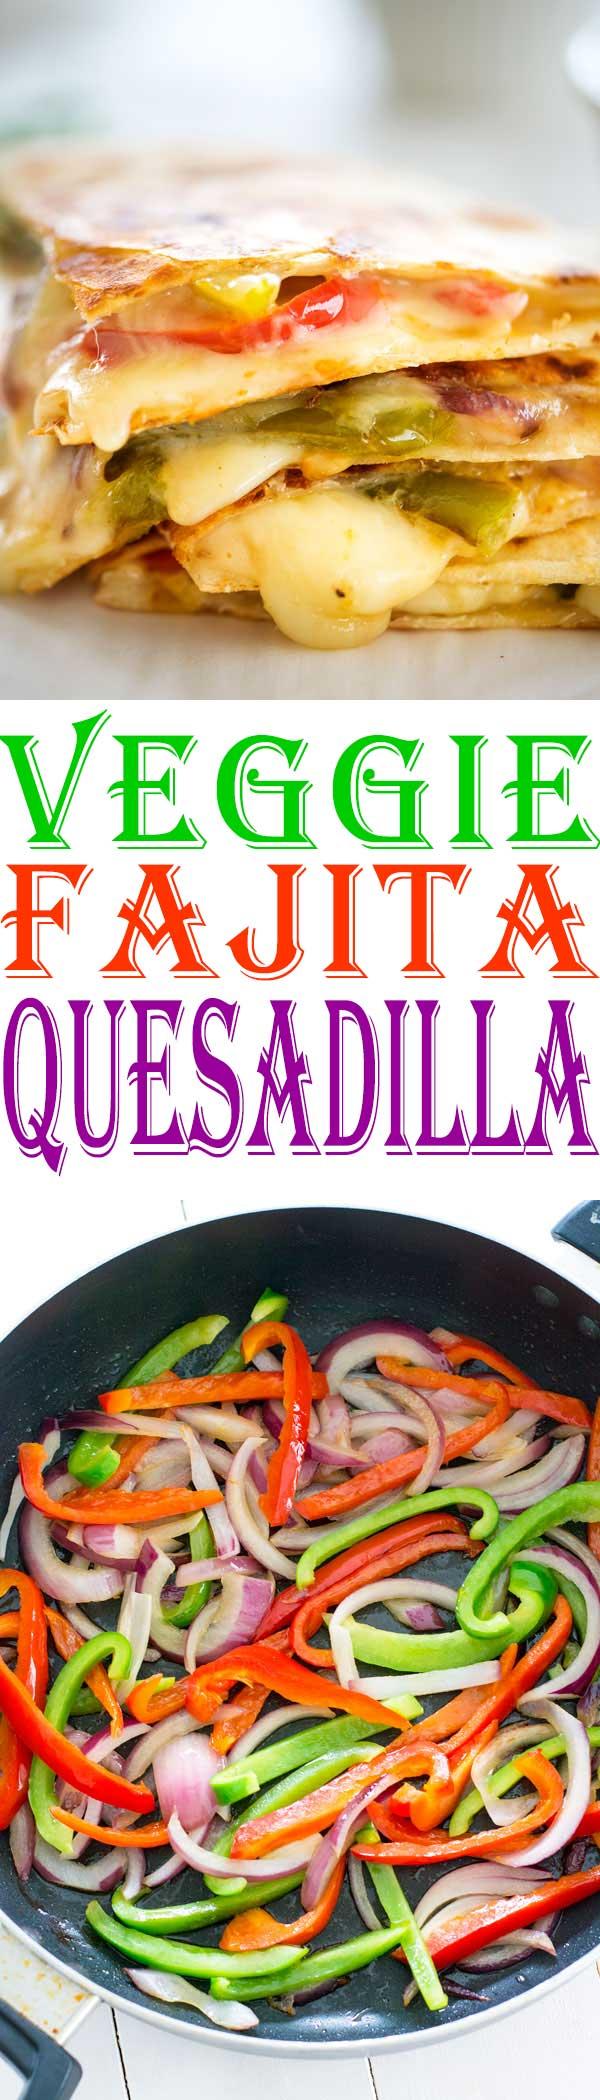 Mexican fajita vegetables are the star of this fajita veggie quesadilla. An easy vegetarian quesadilla recipe everyone will love!